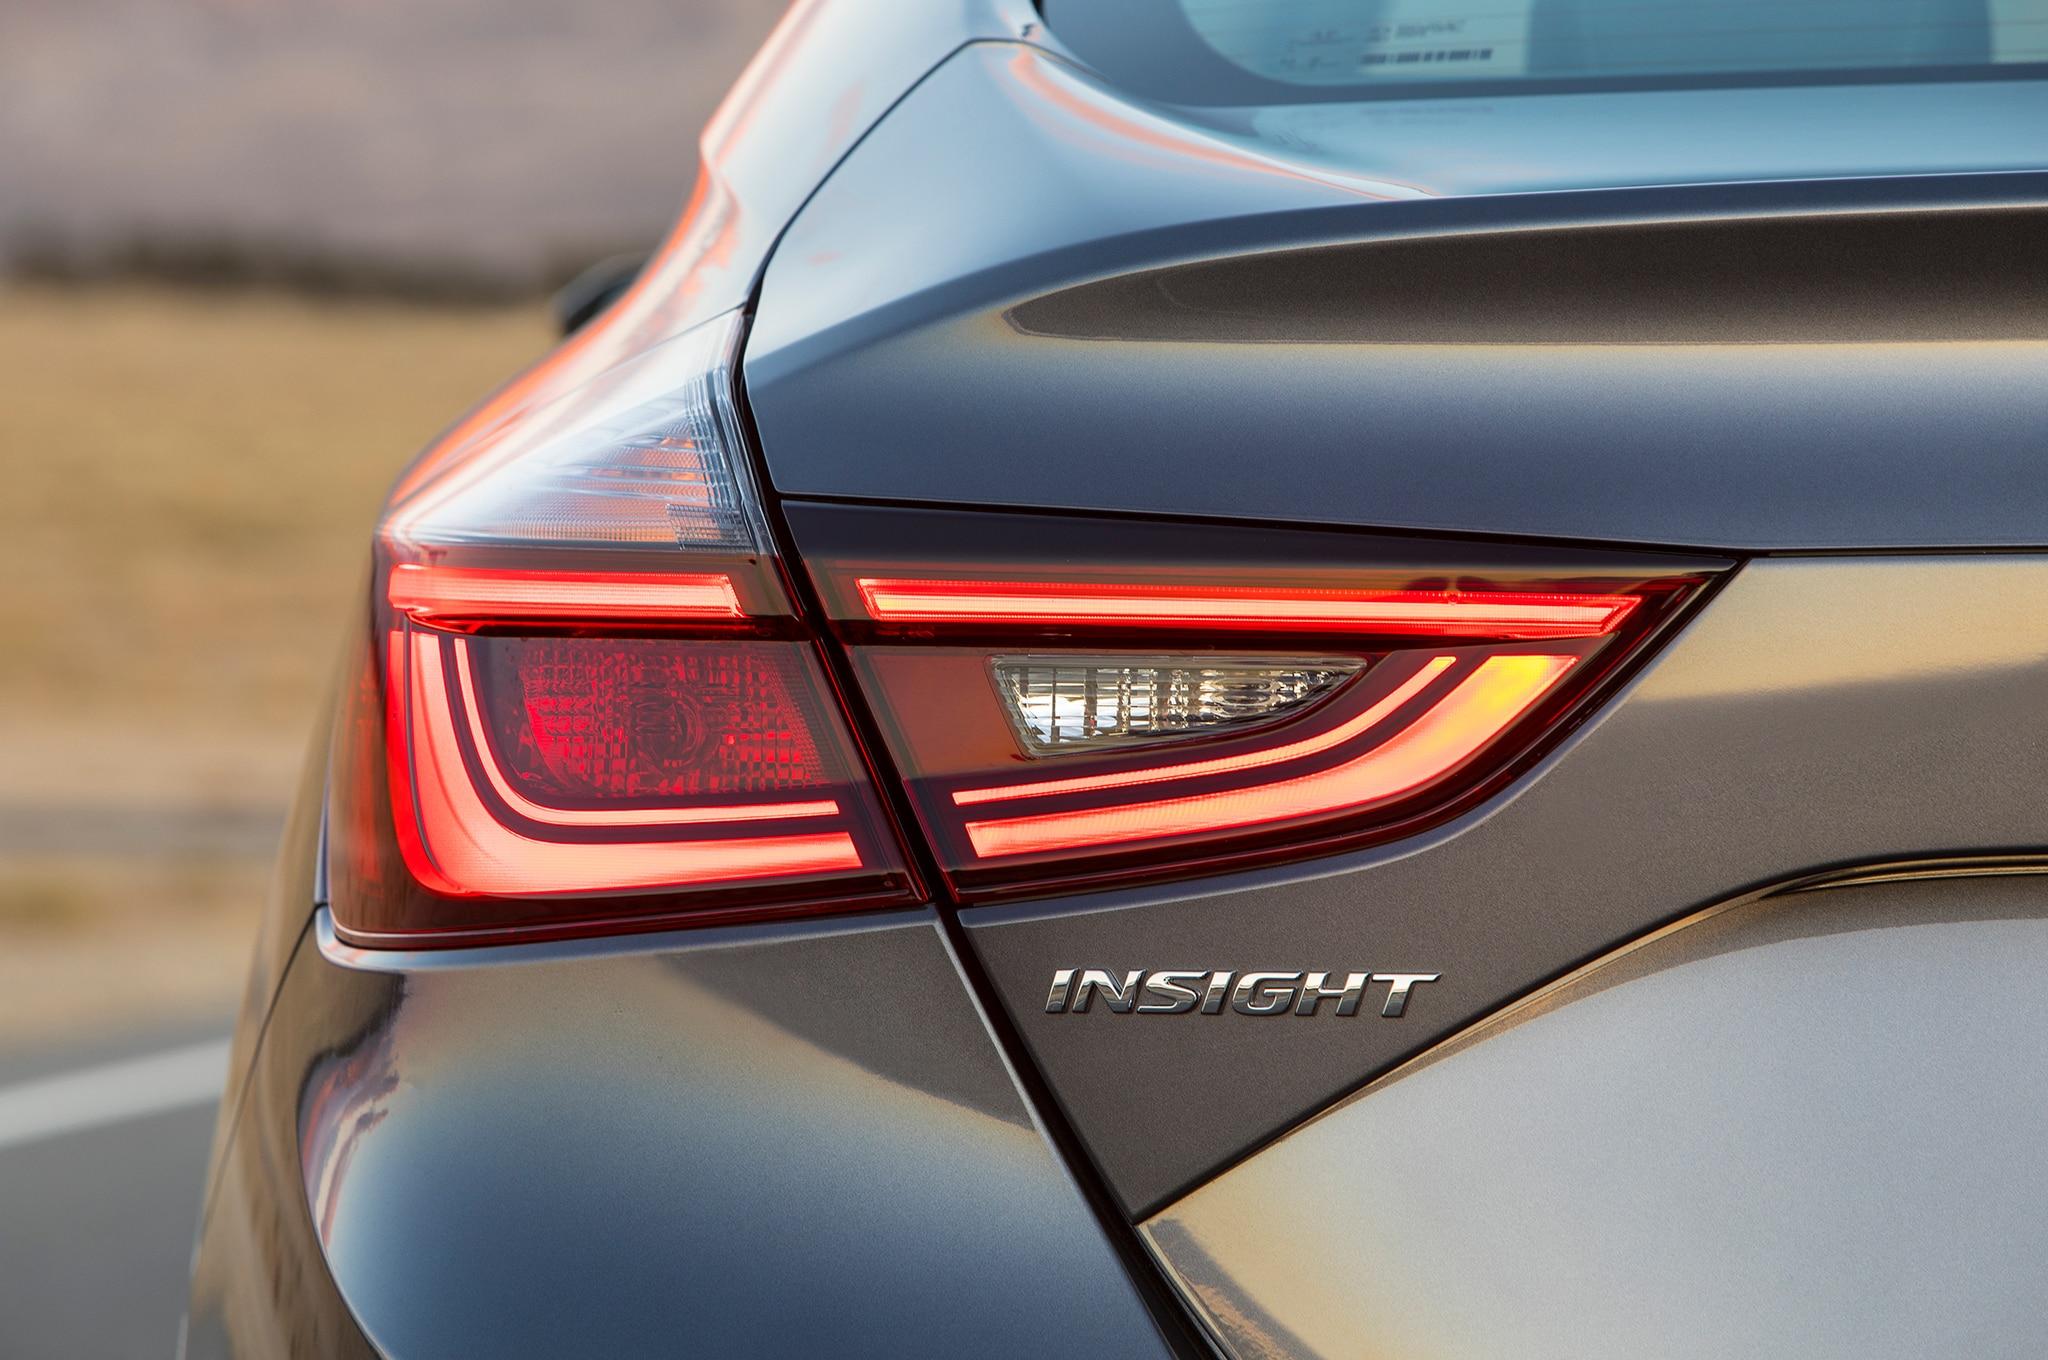 Honda Greensburg Indiana >> 2019 Honda Insight Gets Up to 55 MPG | Automobile Magazine